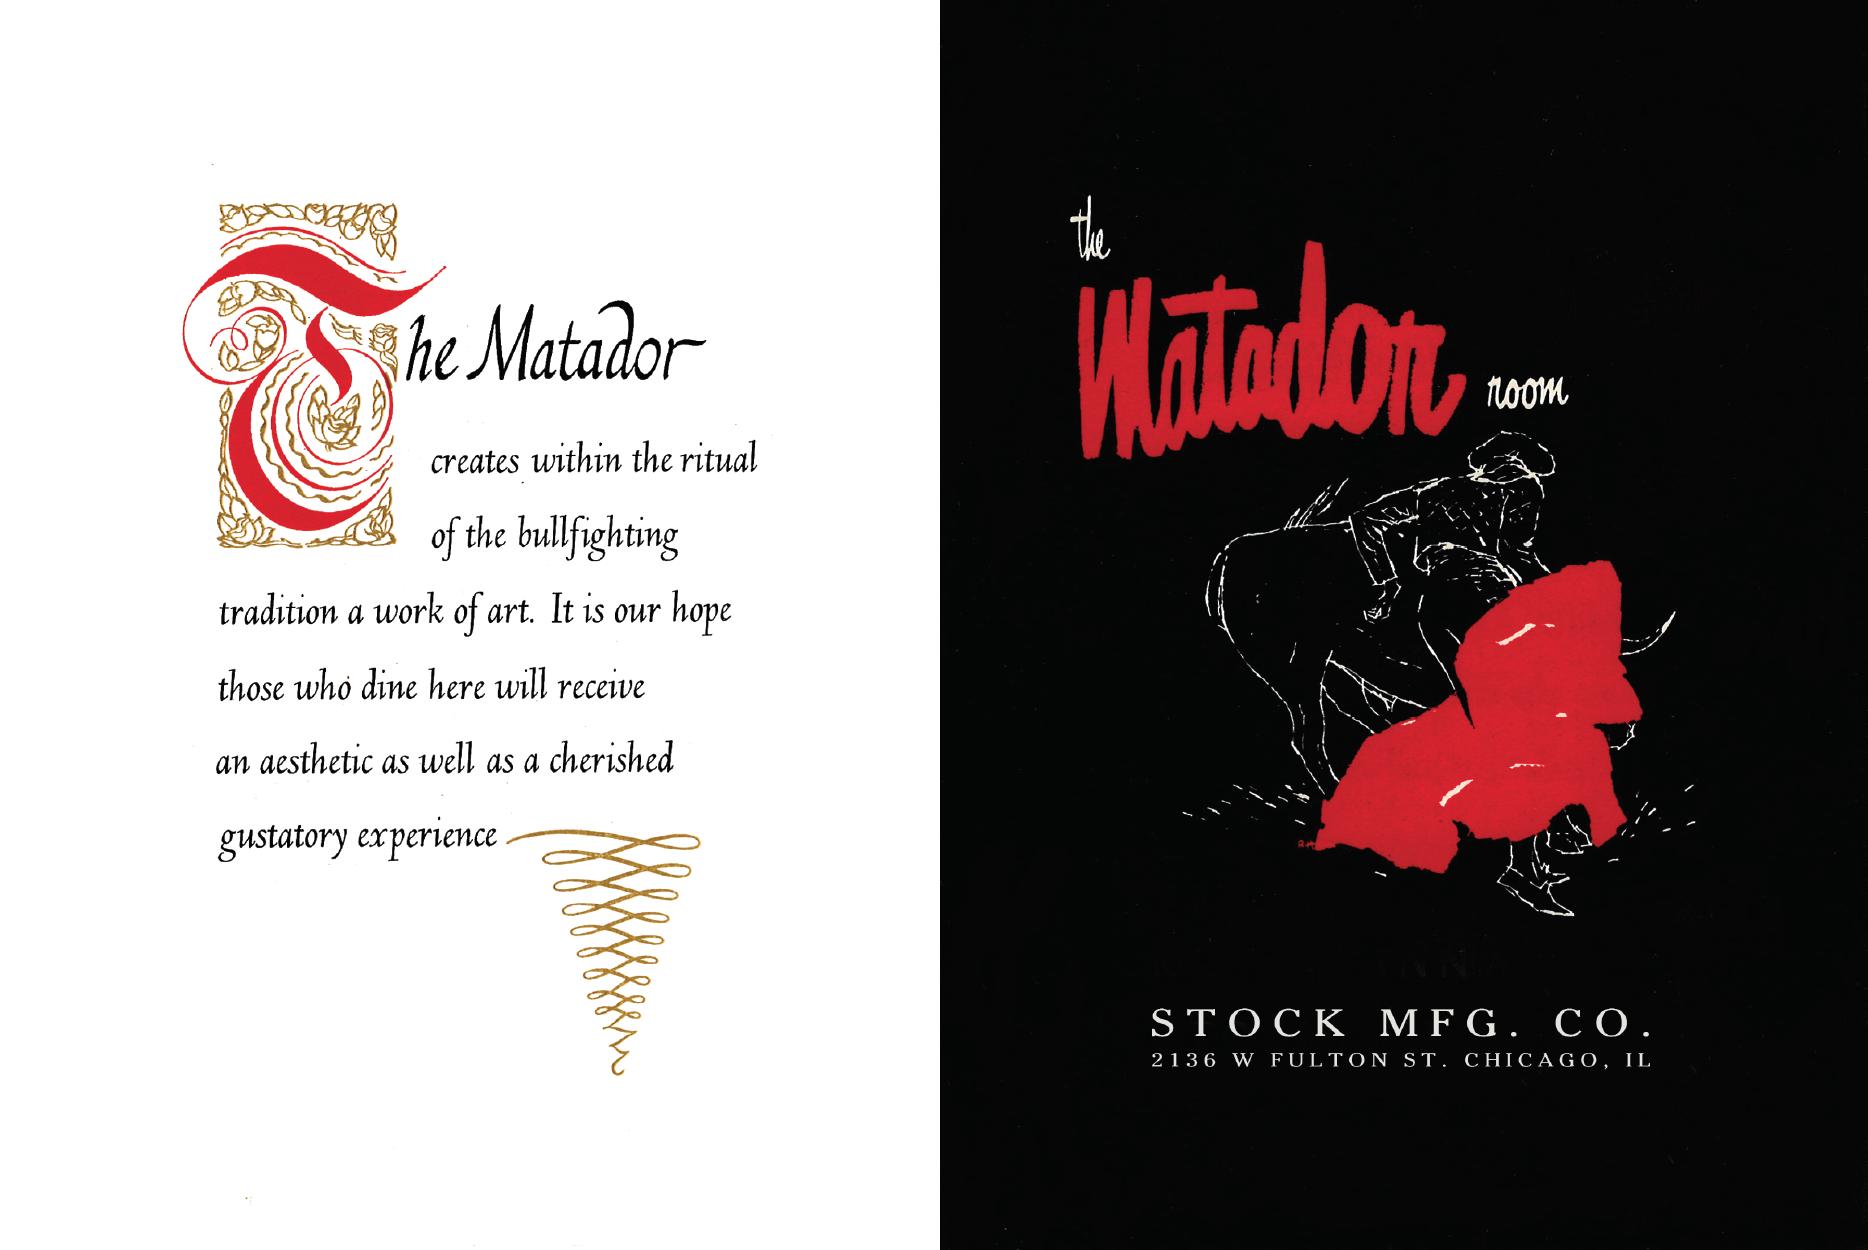 The Matador Room x Stock Mfg. Co. Menu Cover